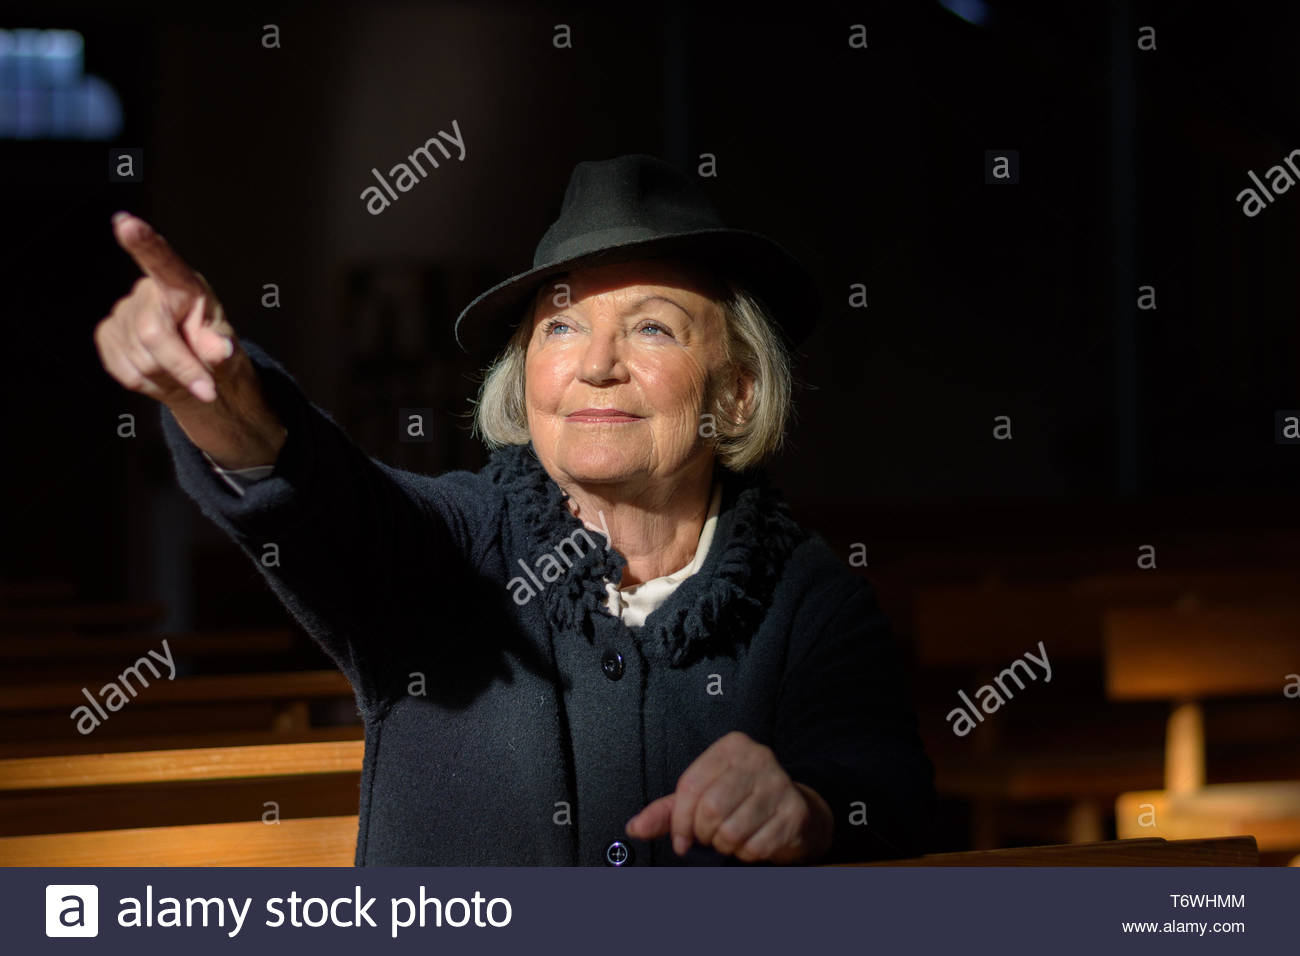 Bereaved elderly lady praying in a church - Stock Image